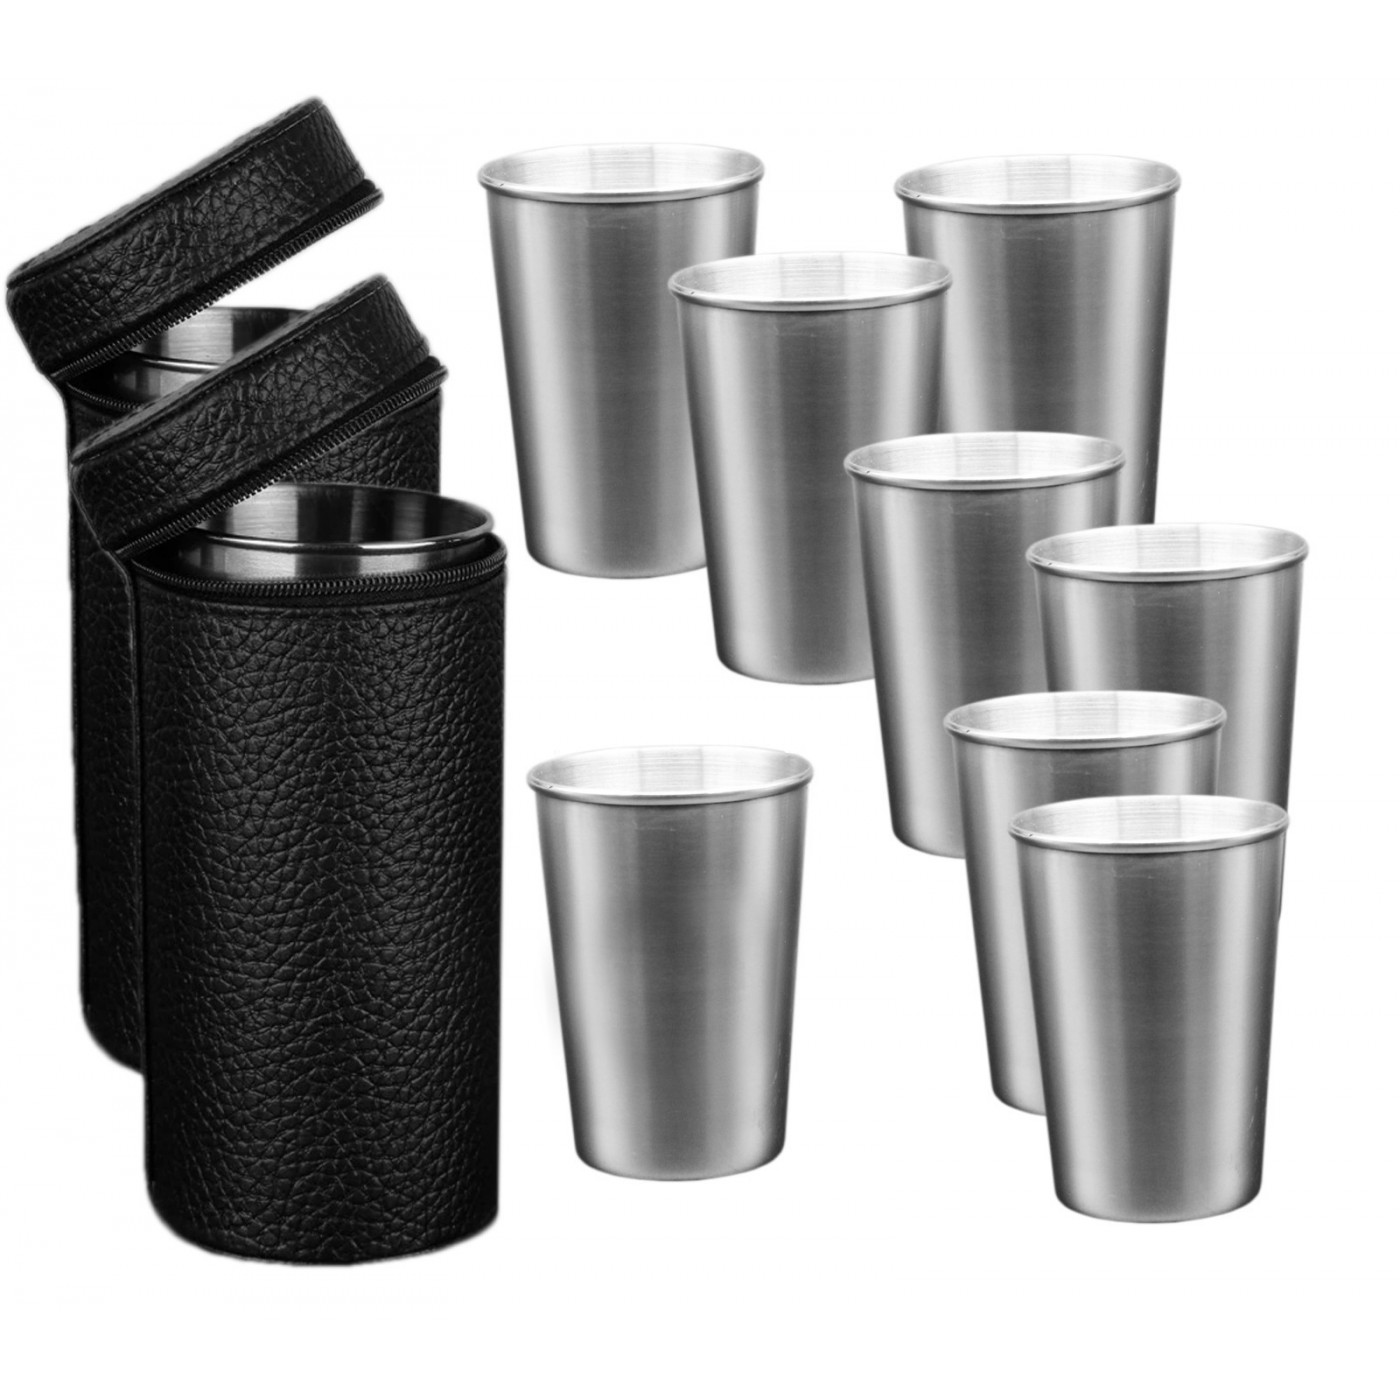 Ensemble de 8 tasses en acier inoxydable (170 ml) avec 2 sacs en cuir  - 1